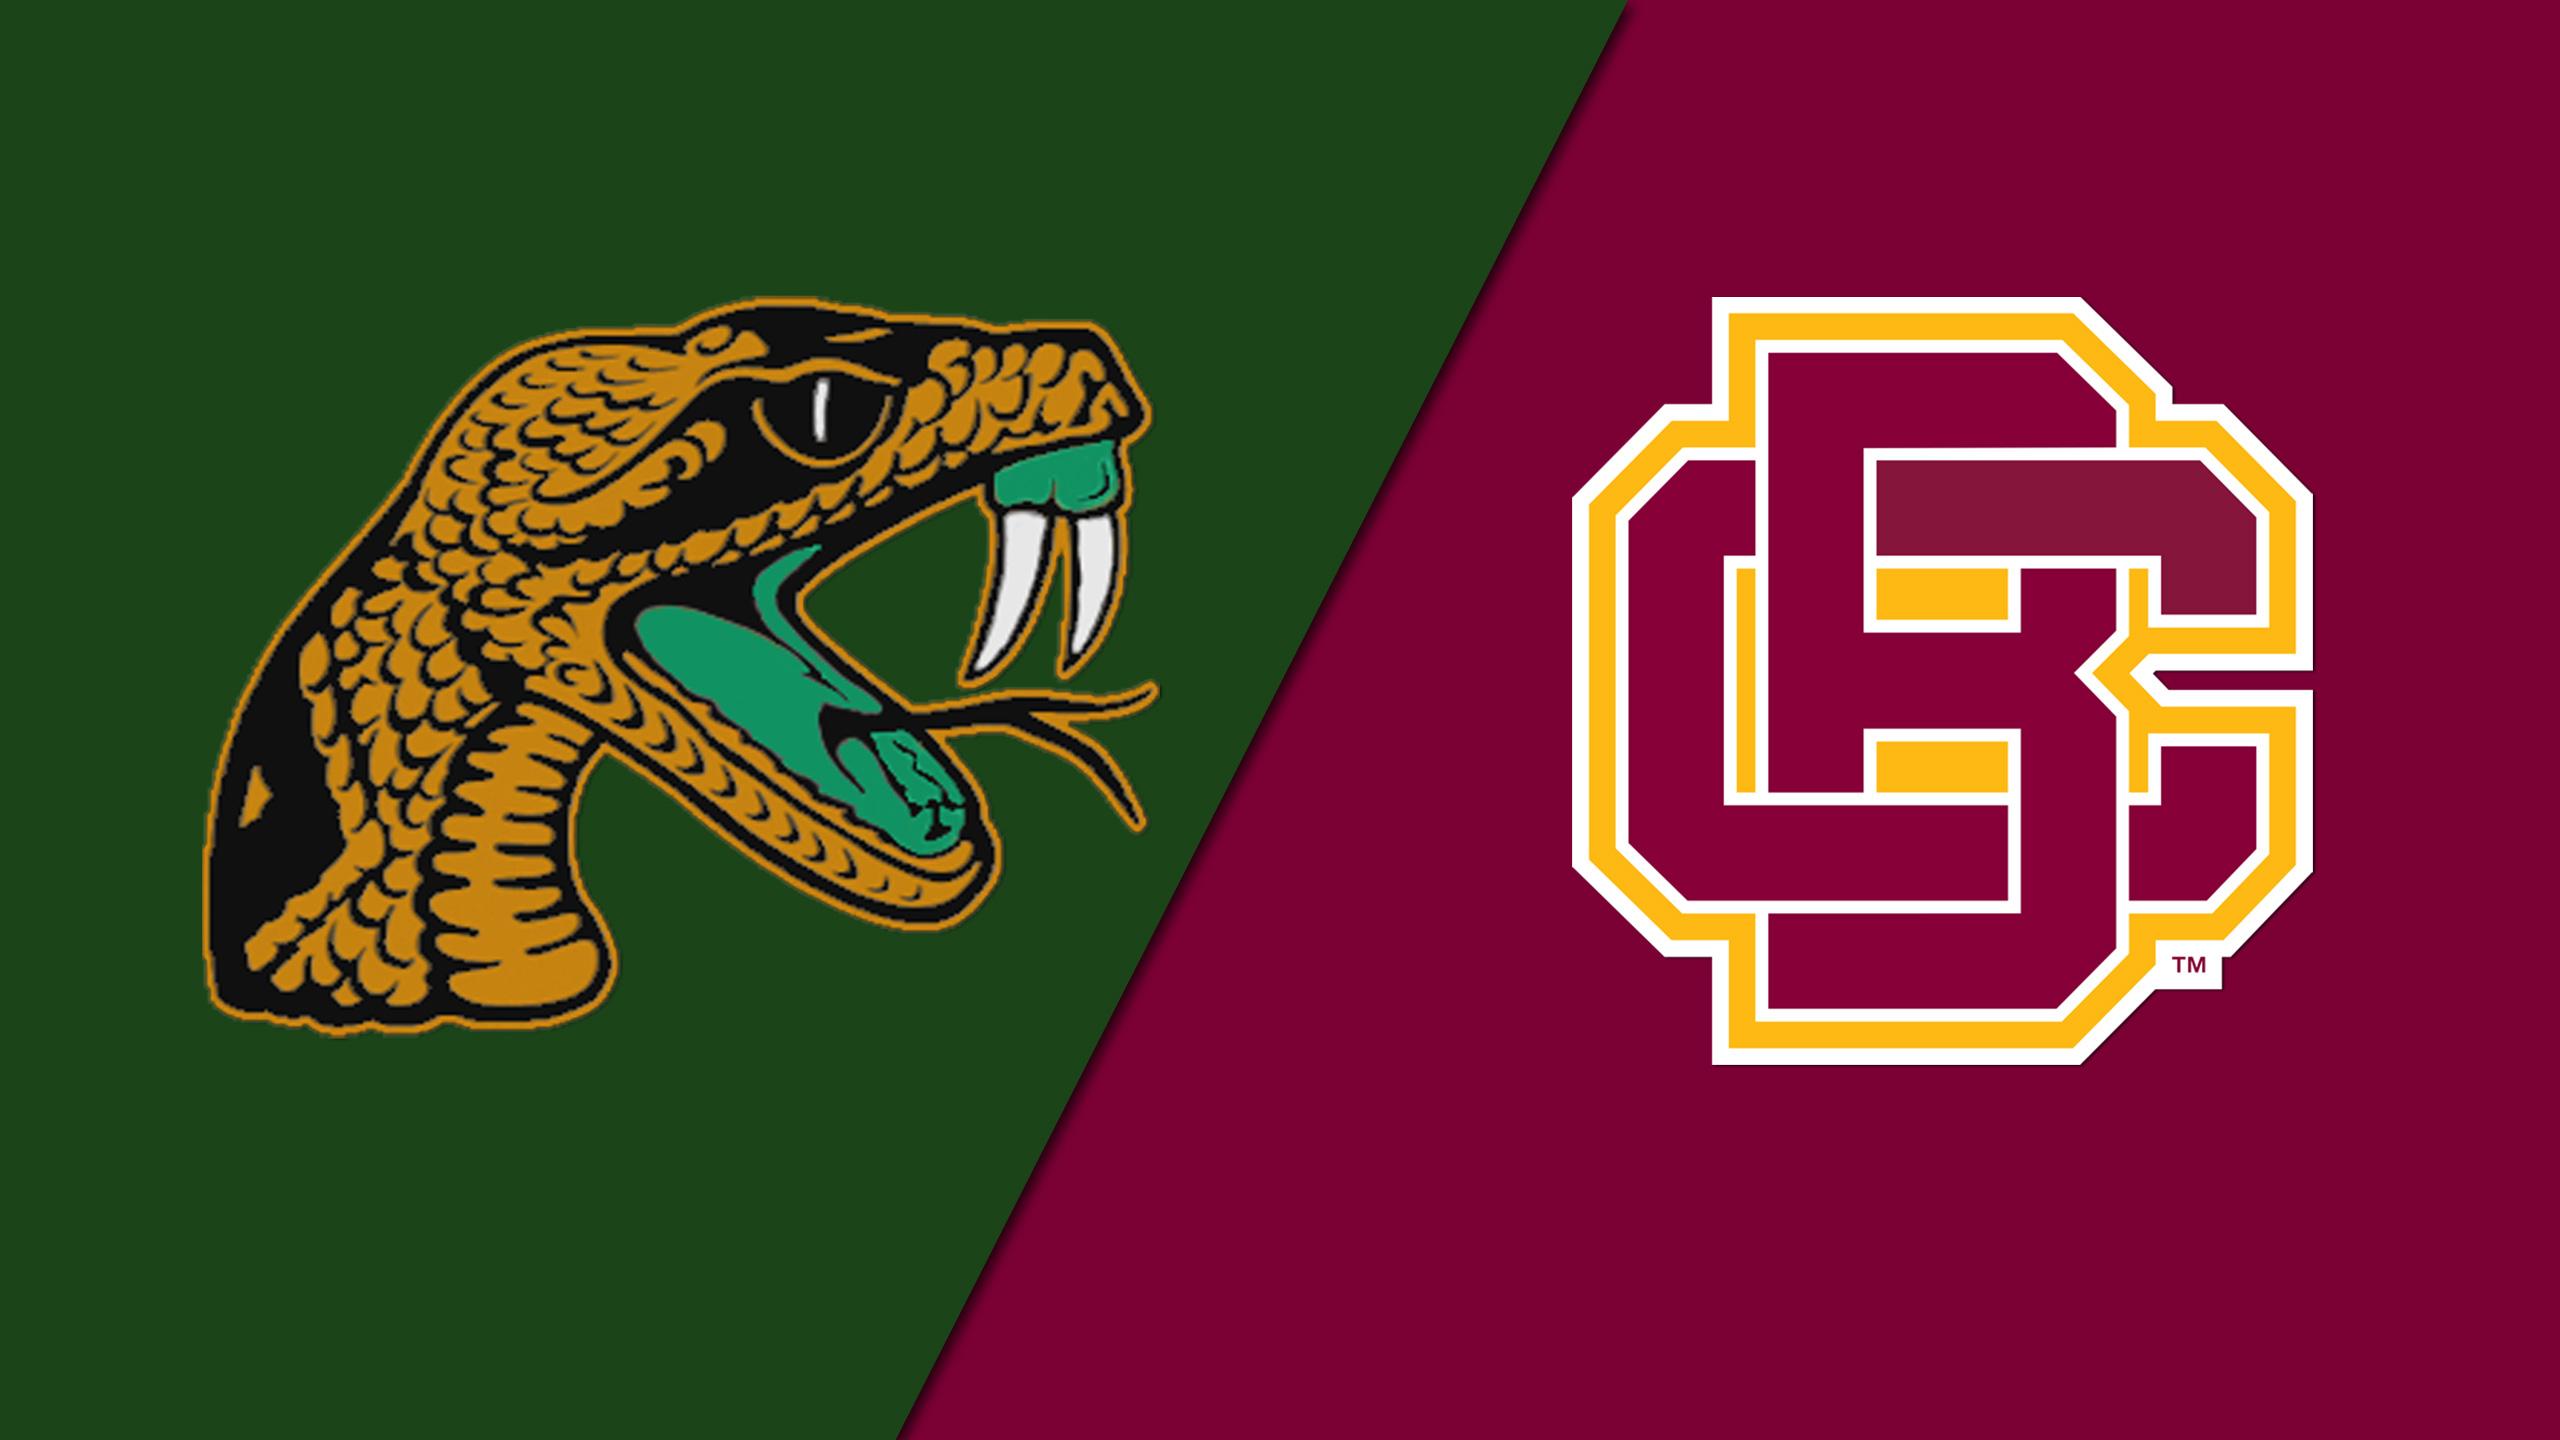 Florida A&M vs. Bethune-Cookman